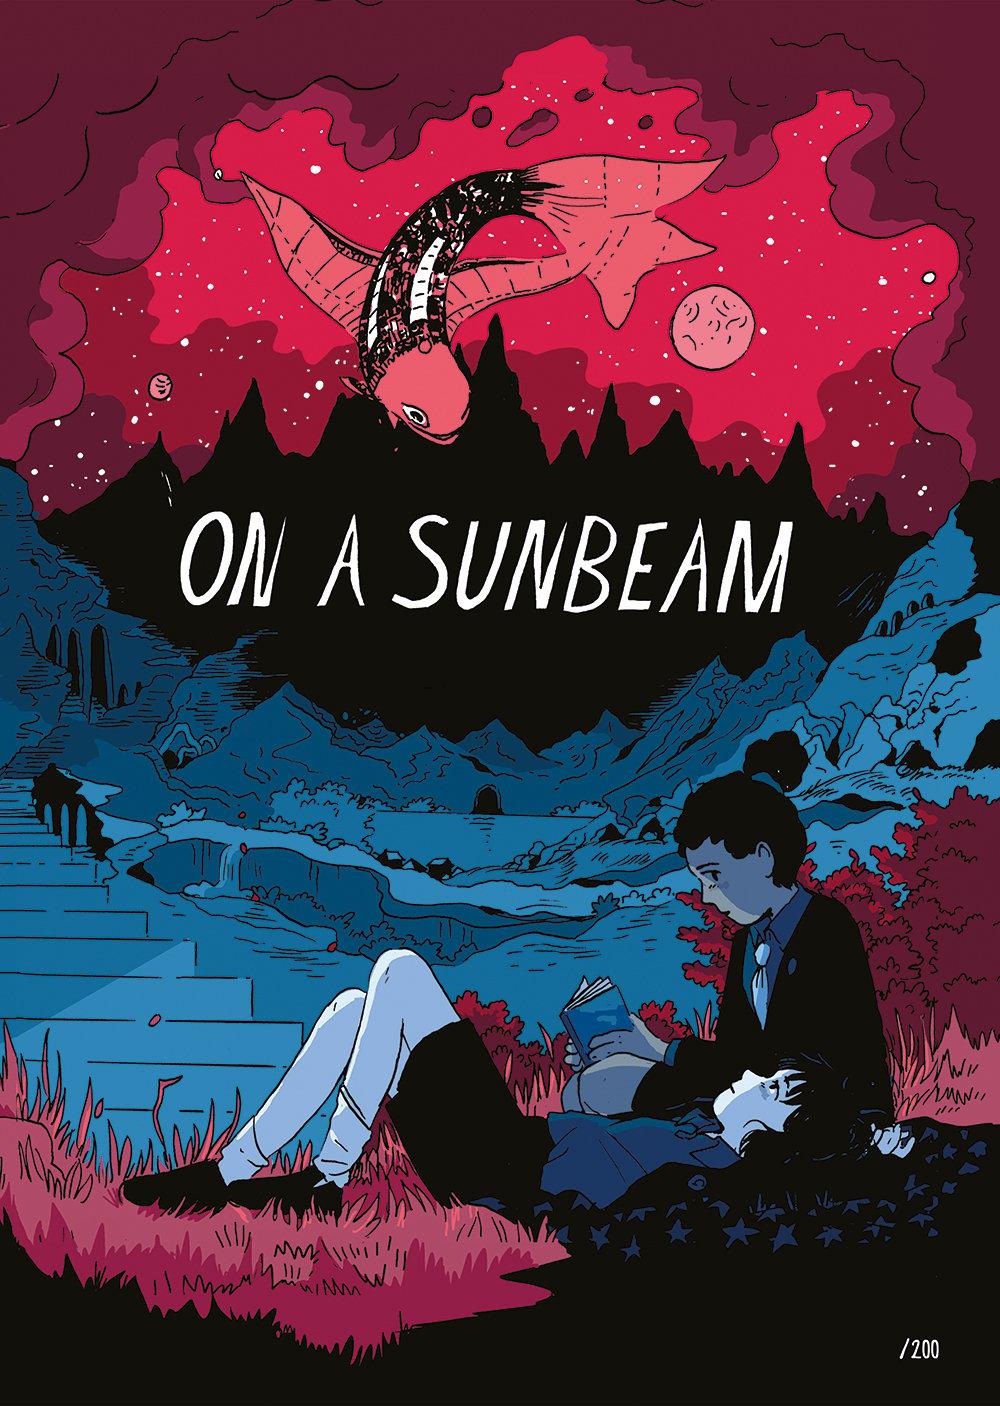 On A Sunbeam Limited Edition A3 Print